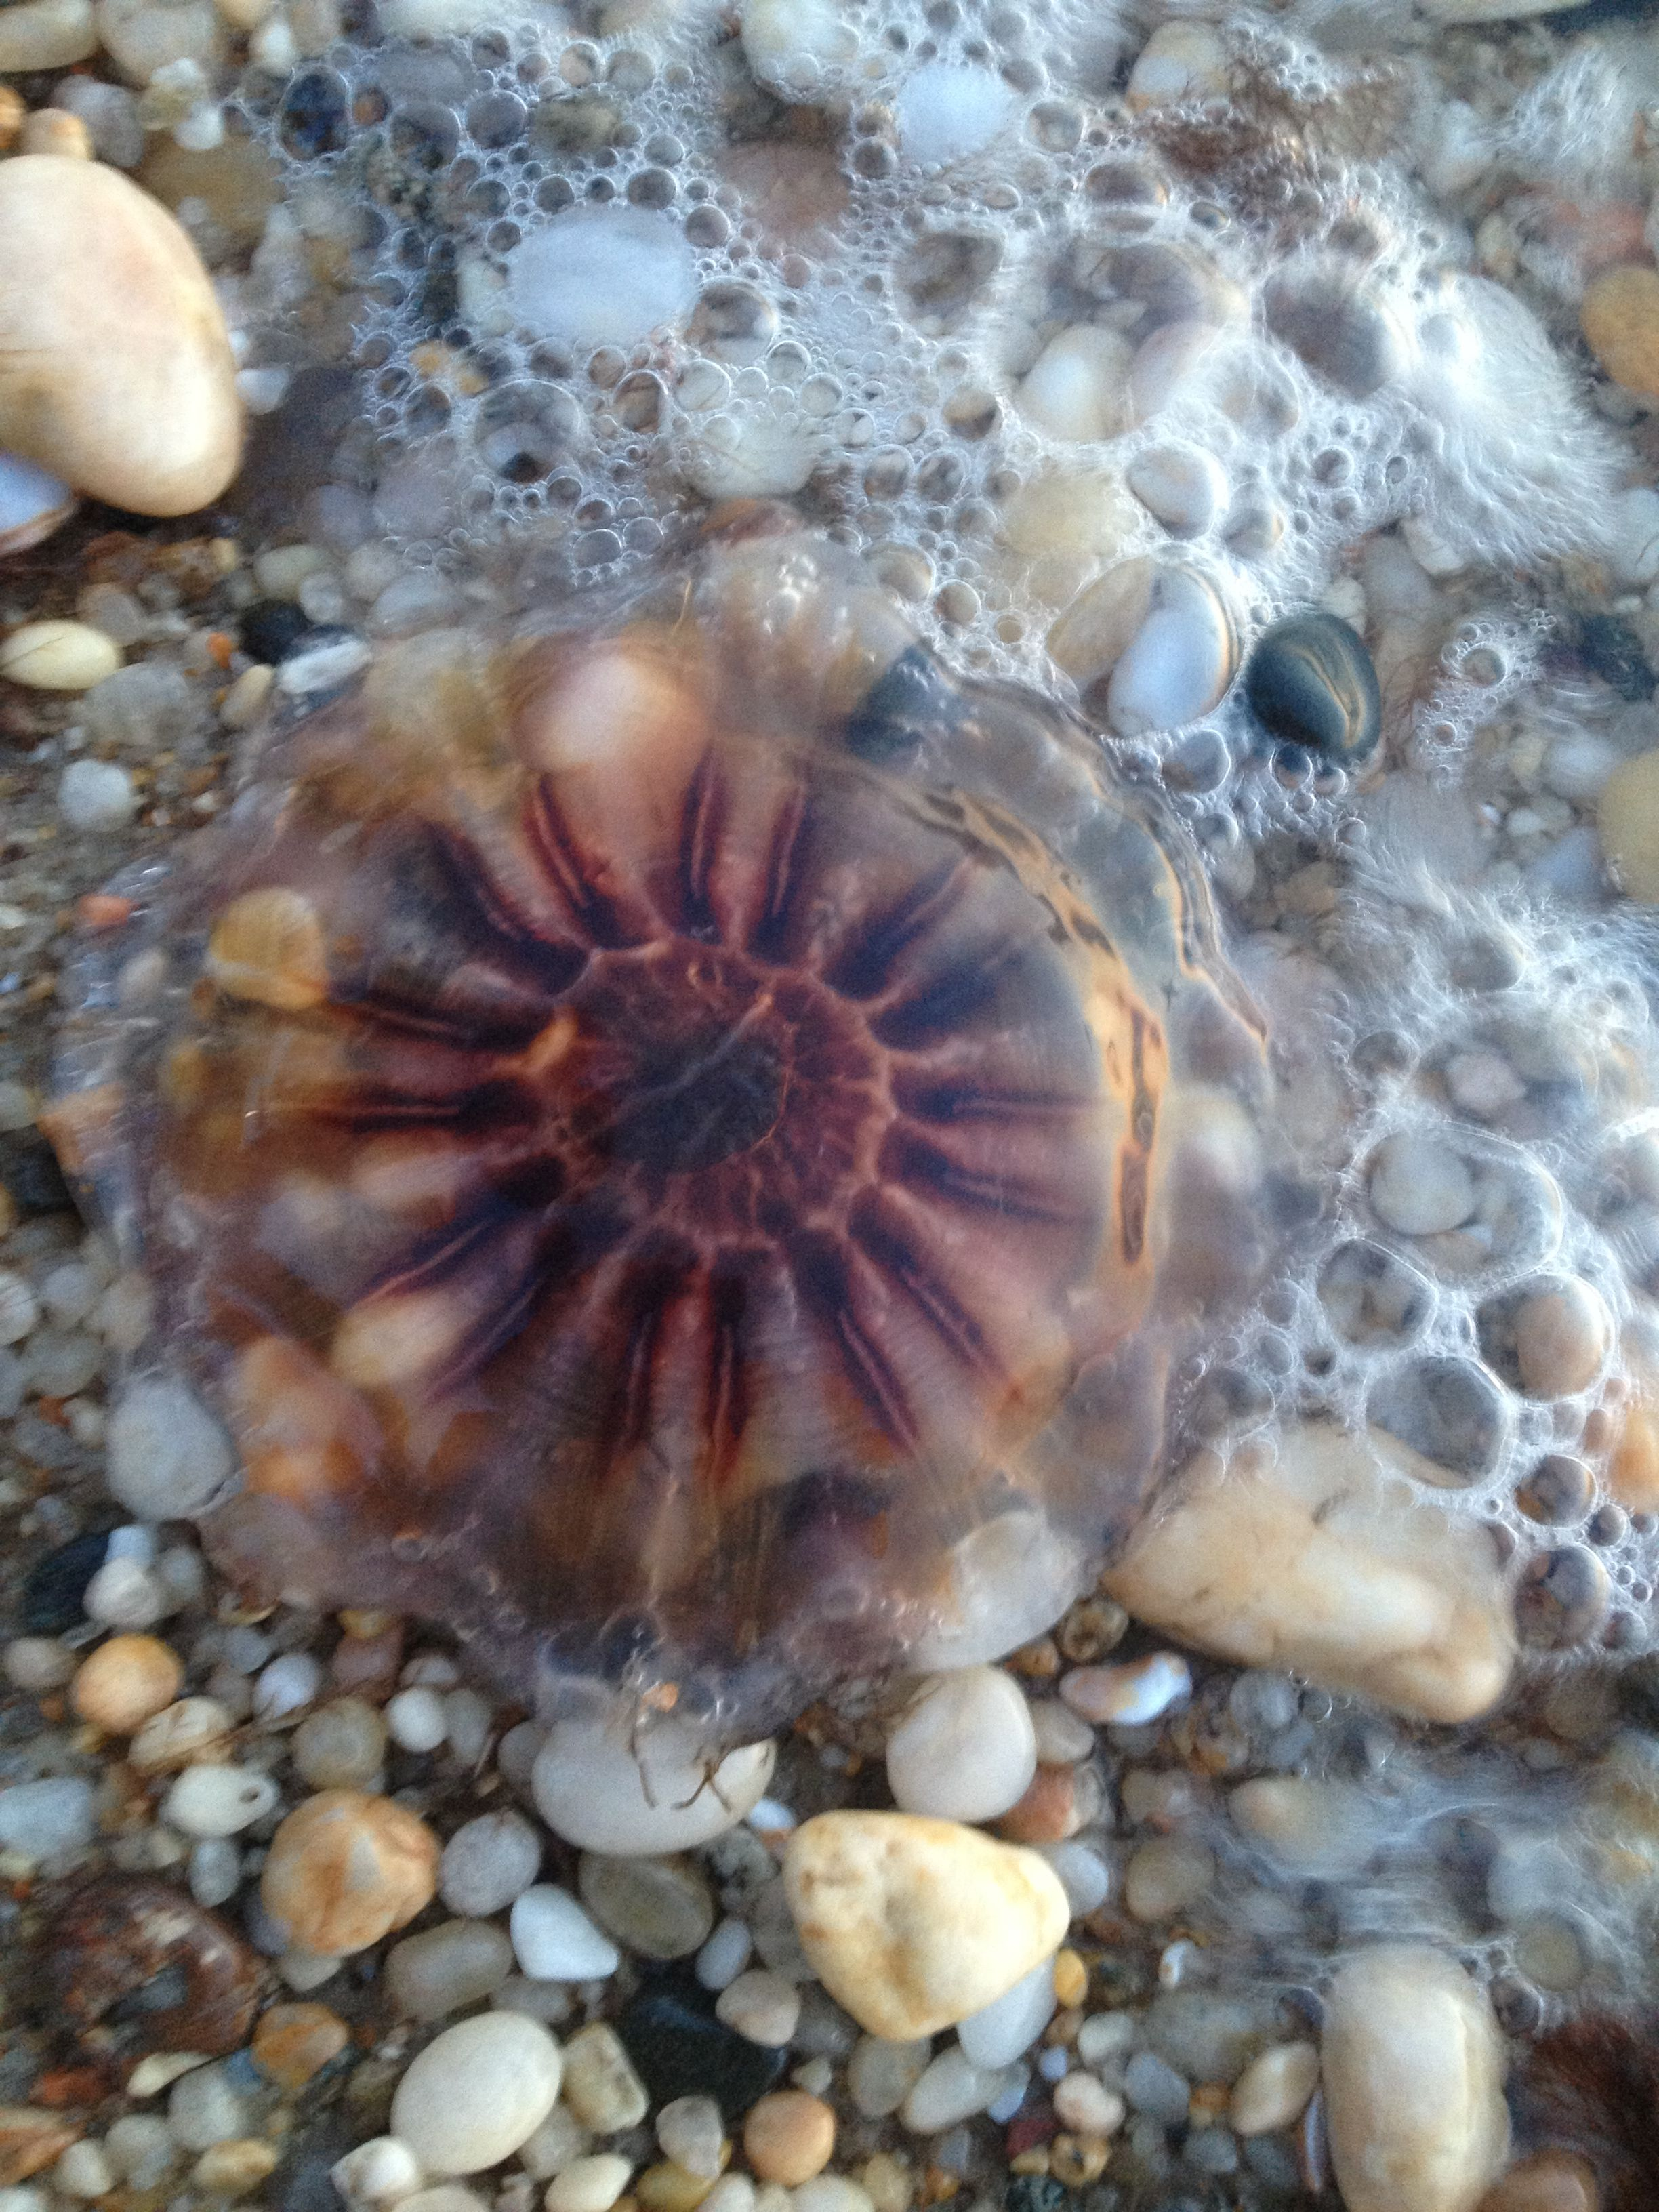 Jellyfish Washed Ashore At Greenport Long Island Long Island Long Island Sound Island